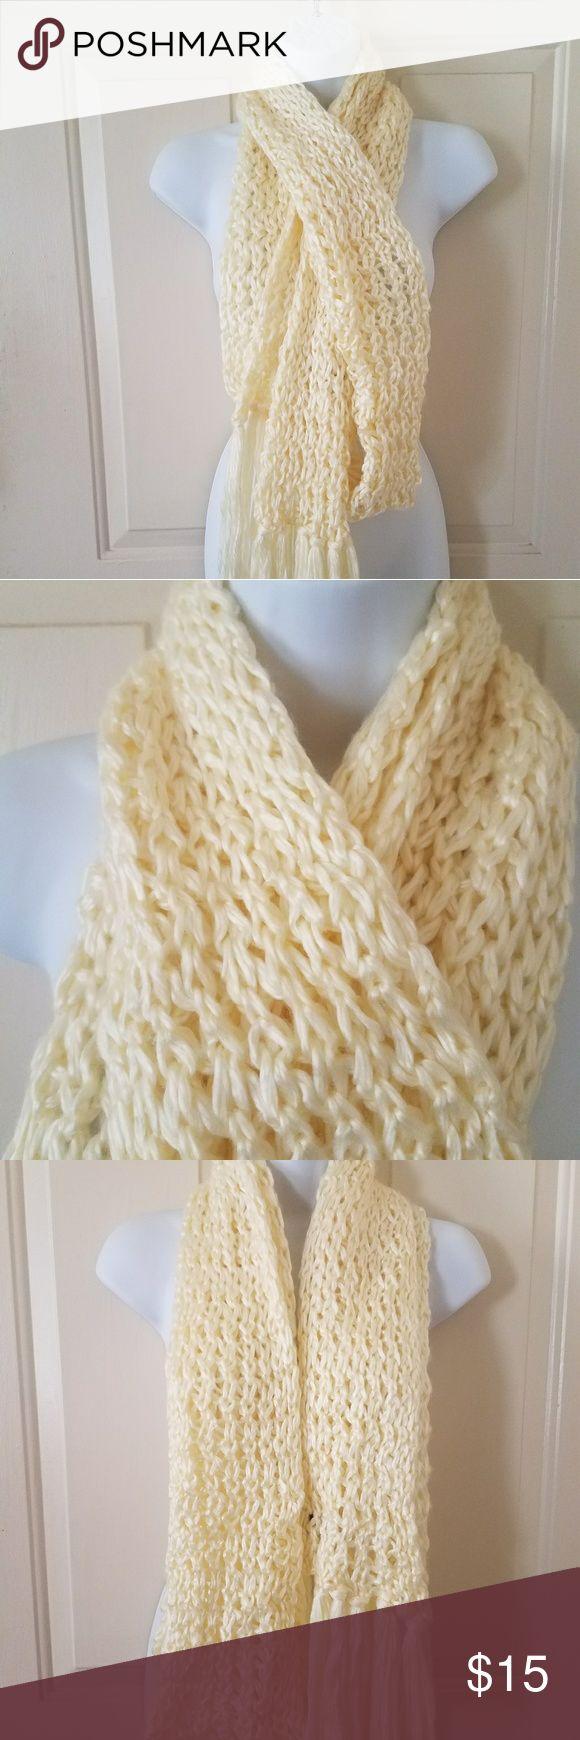 Preston & York Cream Beige Scarf Preston & York Cream Beige Scarf  Very soft and cozy scarf. It's approximately 108 inches long.  On the mannequin, it is folded in half. Preston & York Accessories Scarves & Wraps